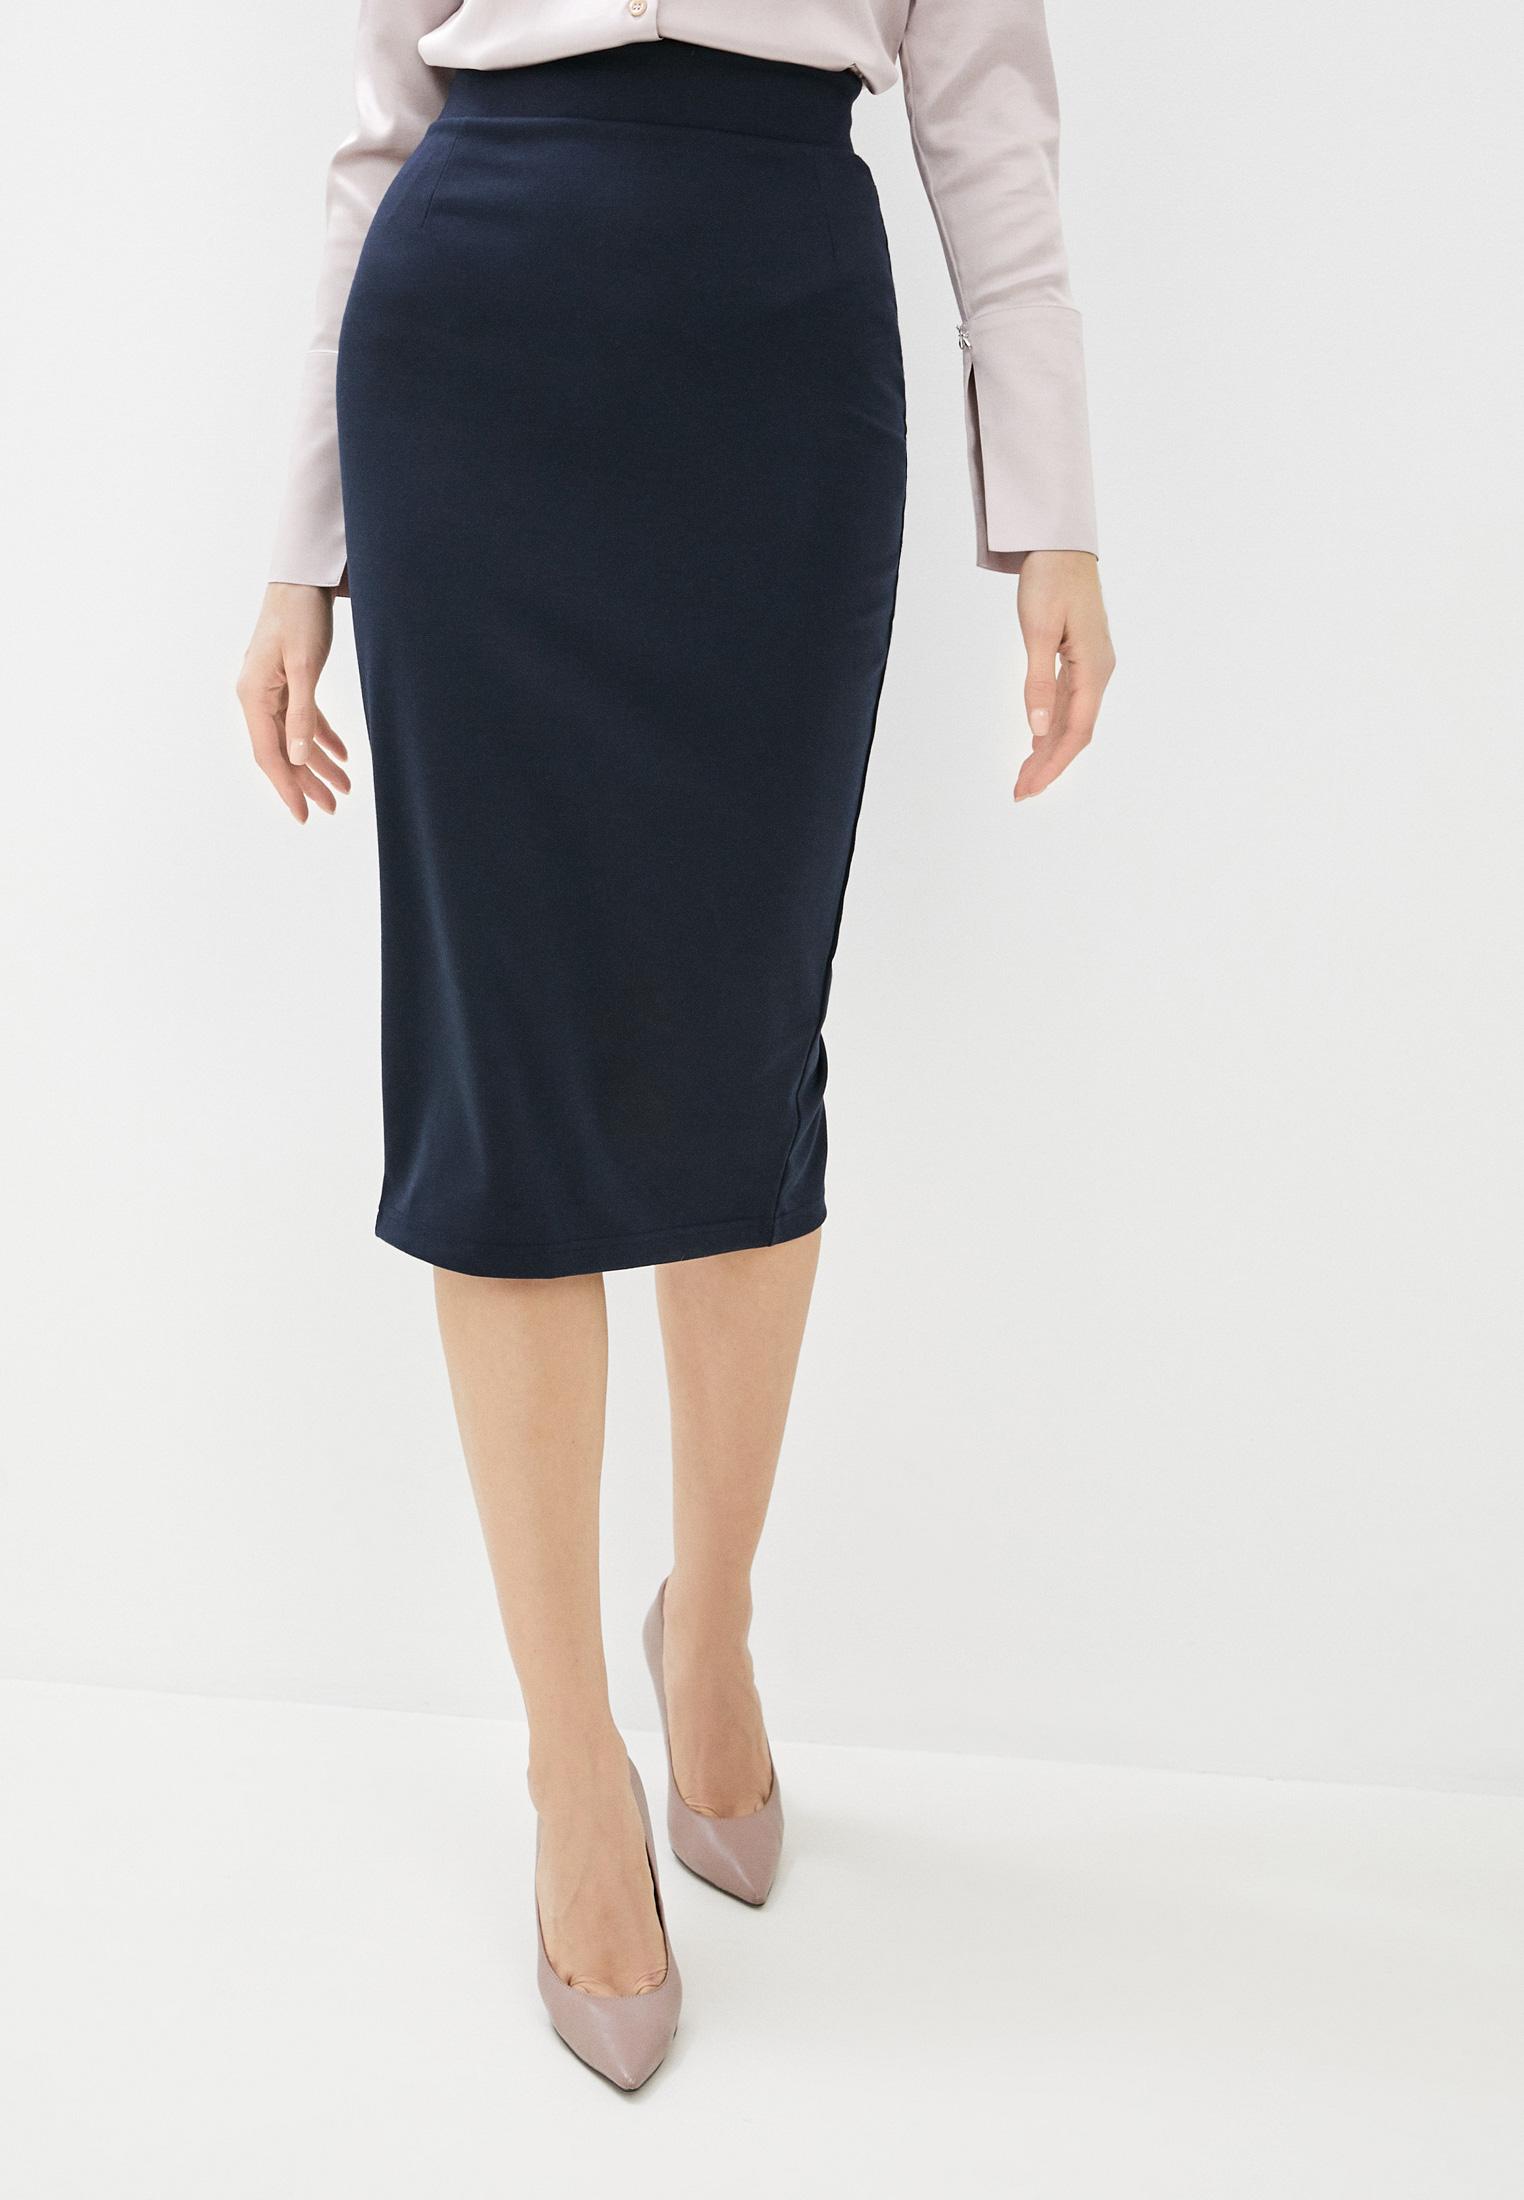 Узкая юбка Toku Tino TT8518027b/: изображение 1